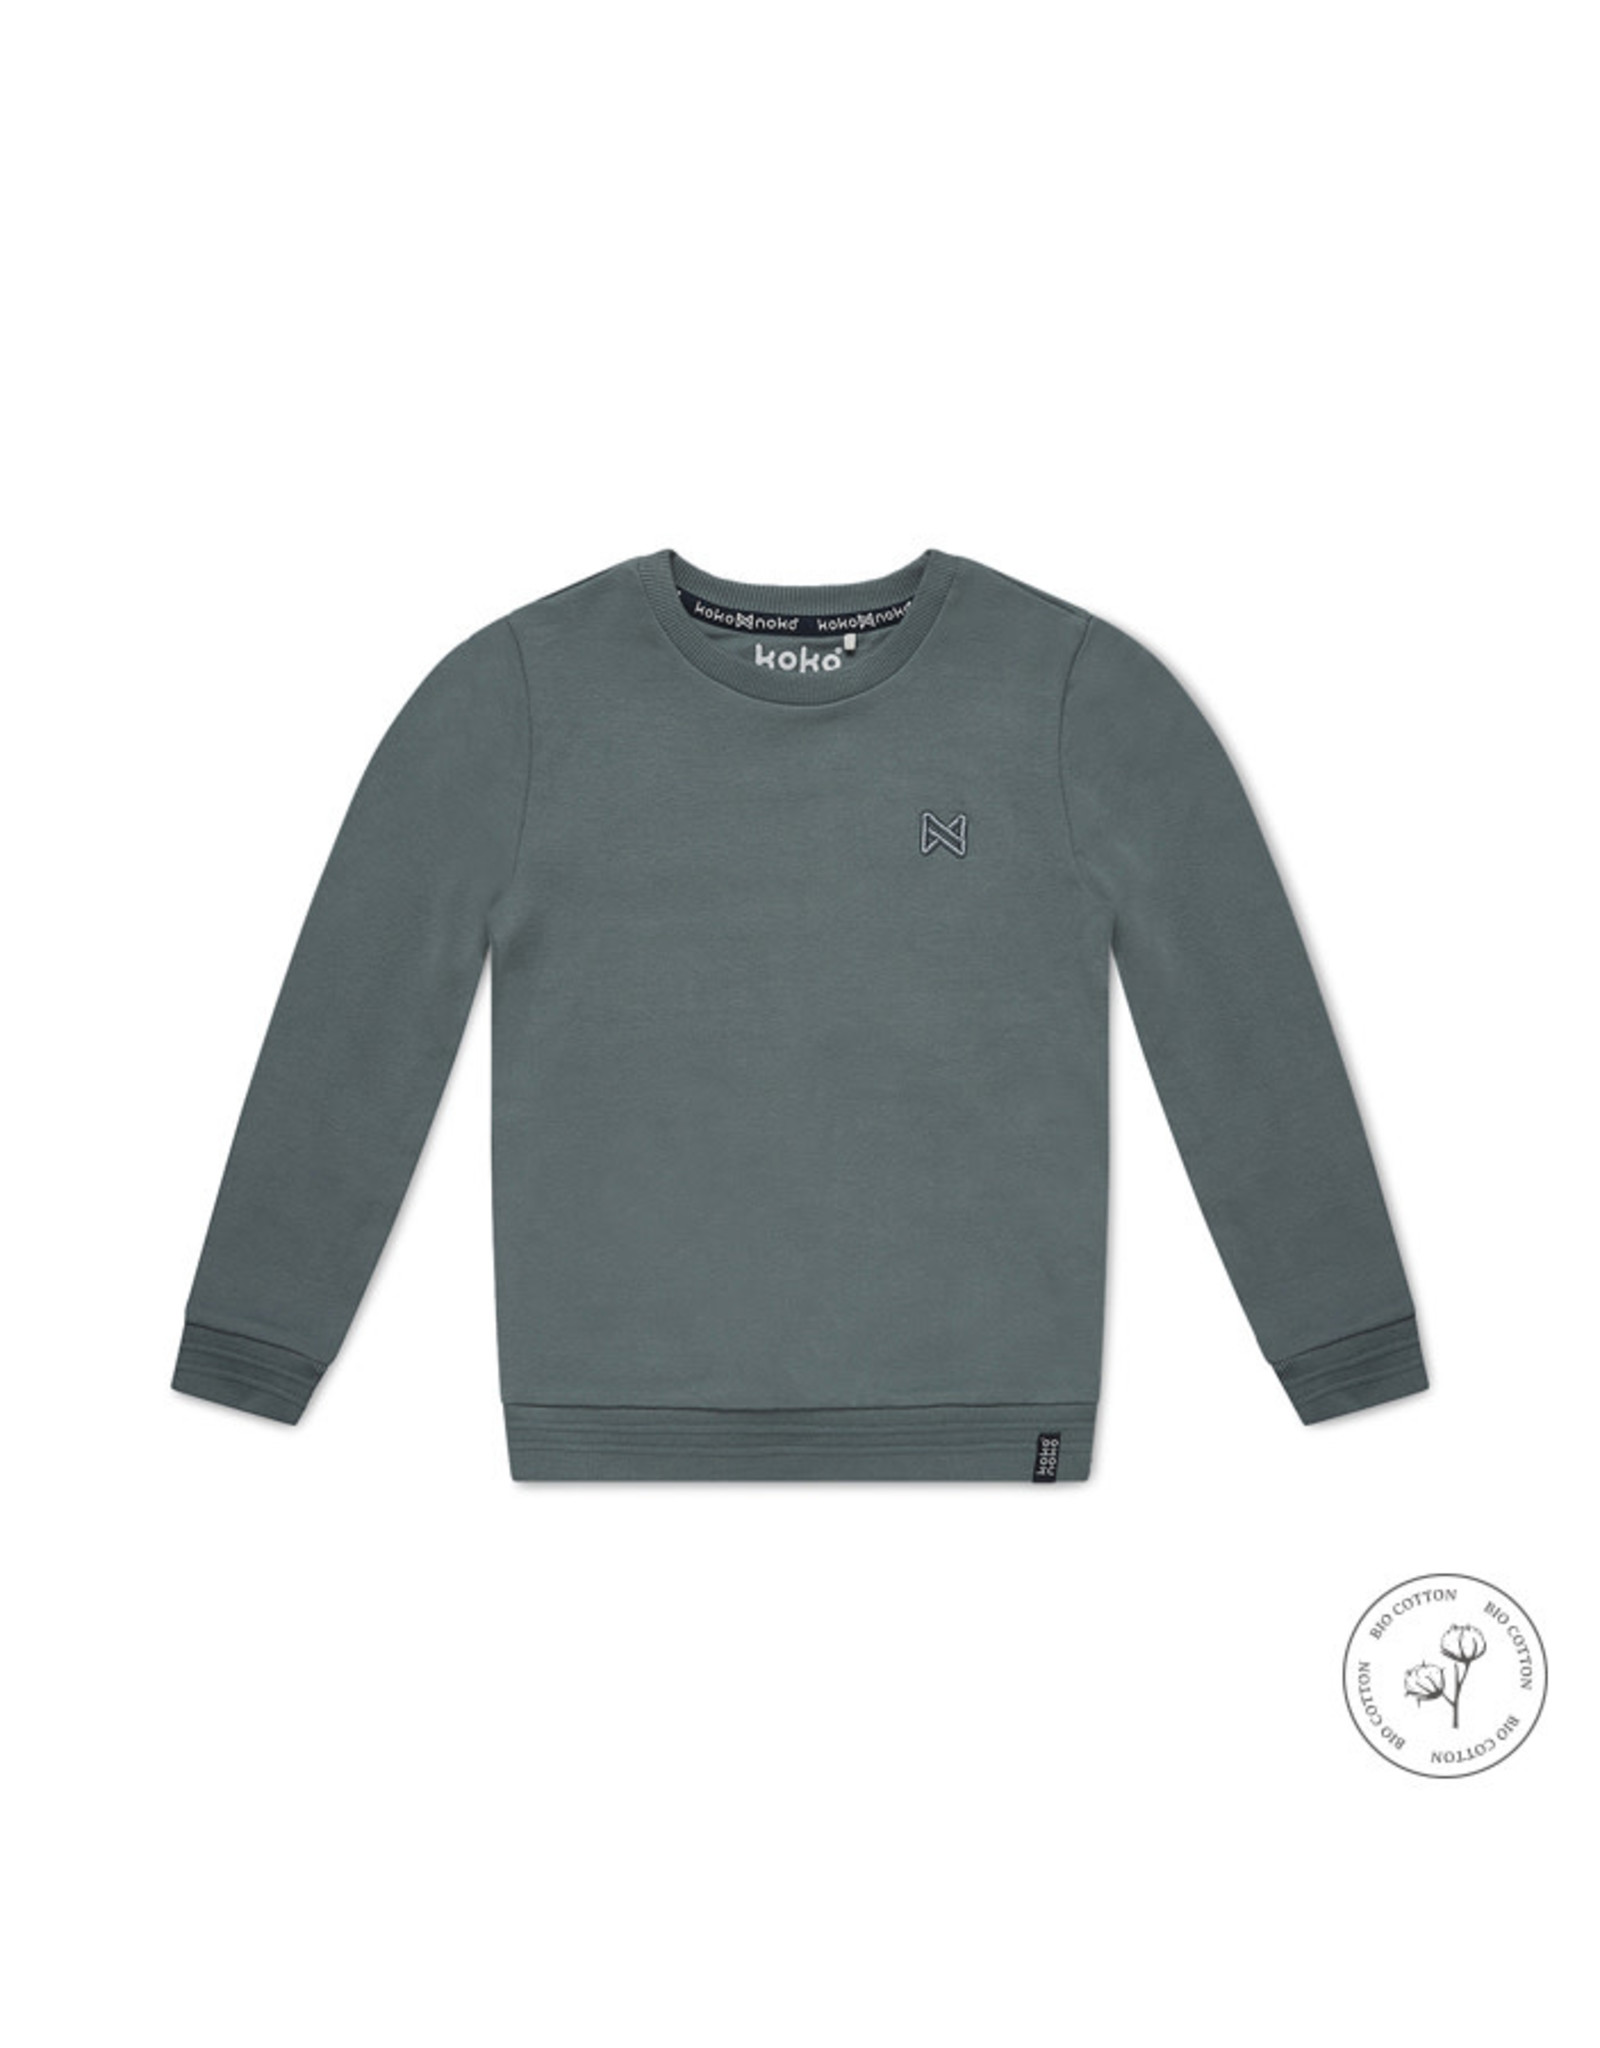 Koko Noko Boys Neill sweater ls Bio Cotton Faded green NOS